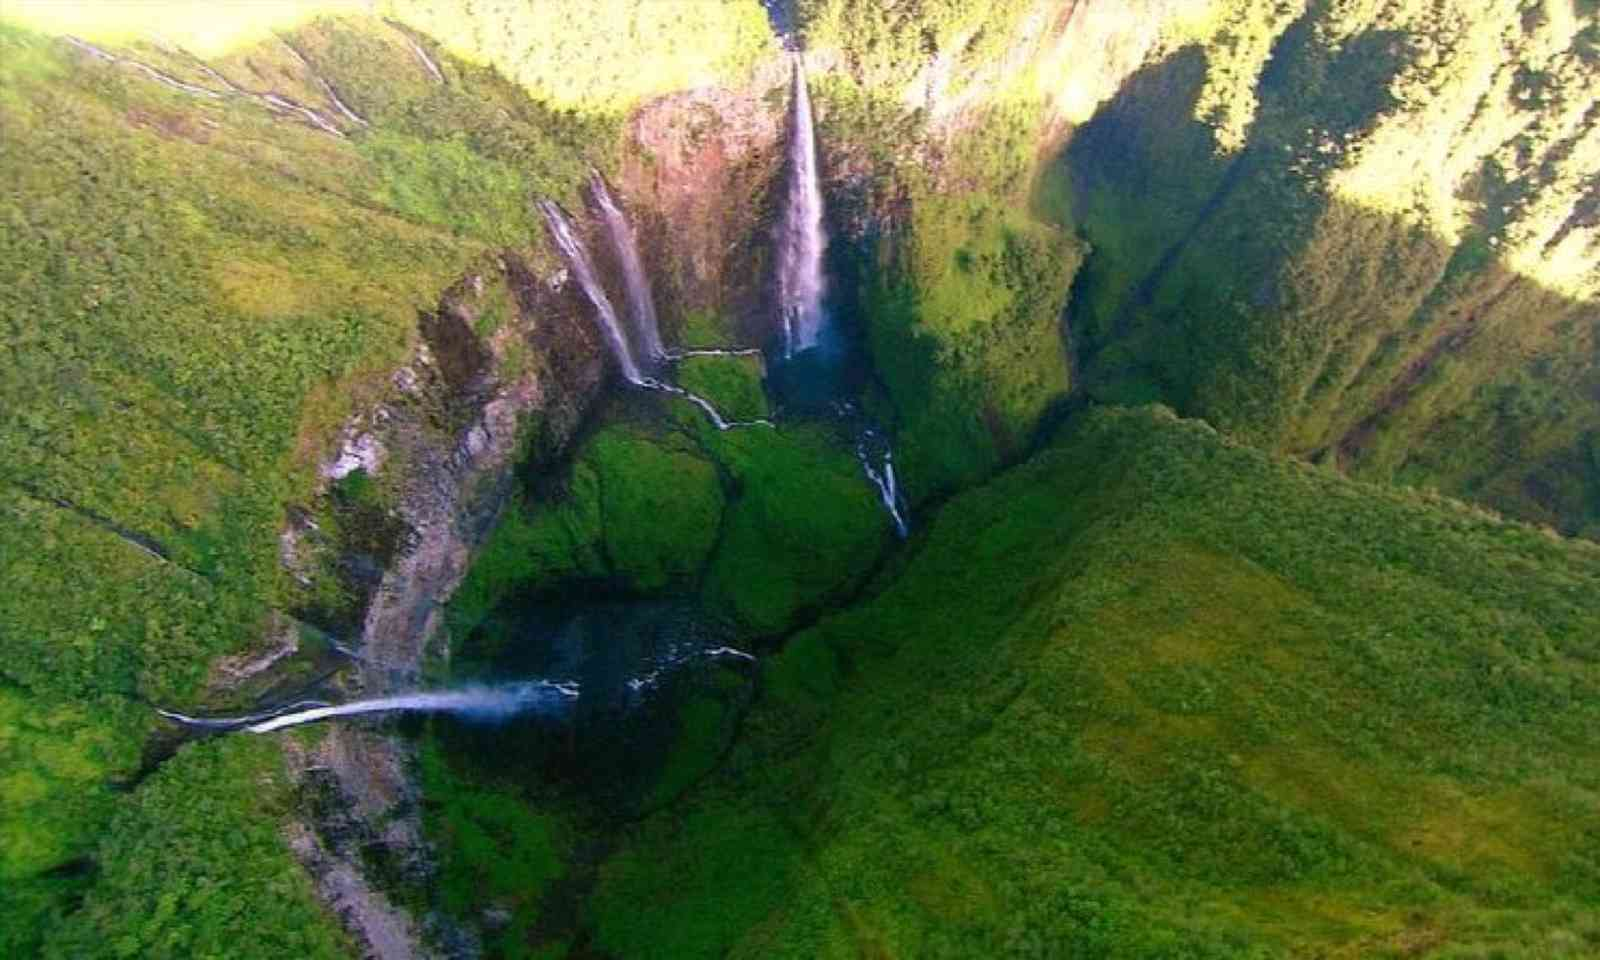 Trou de Fer from above (Creative Commons: Jennifer_greatoutdoors)